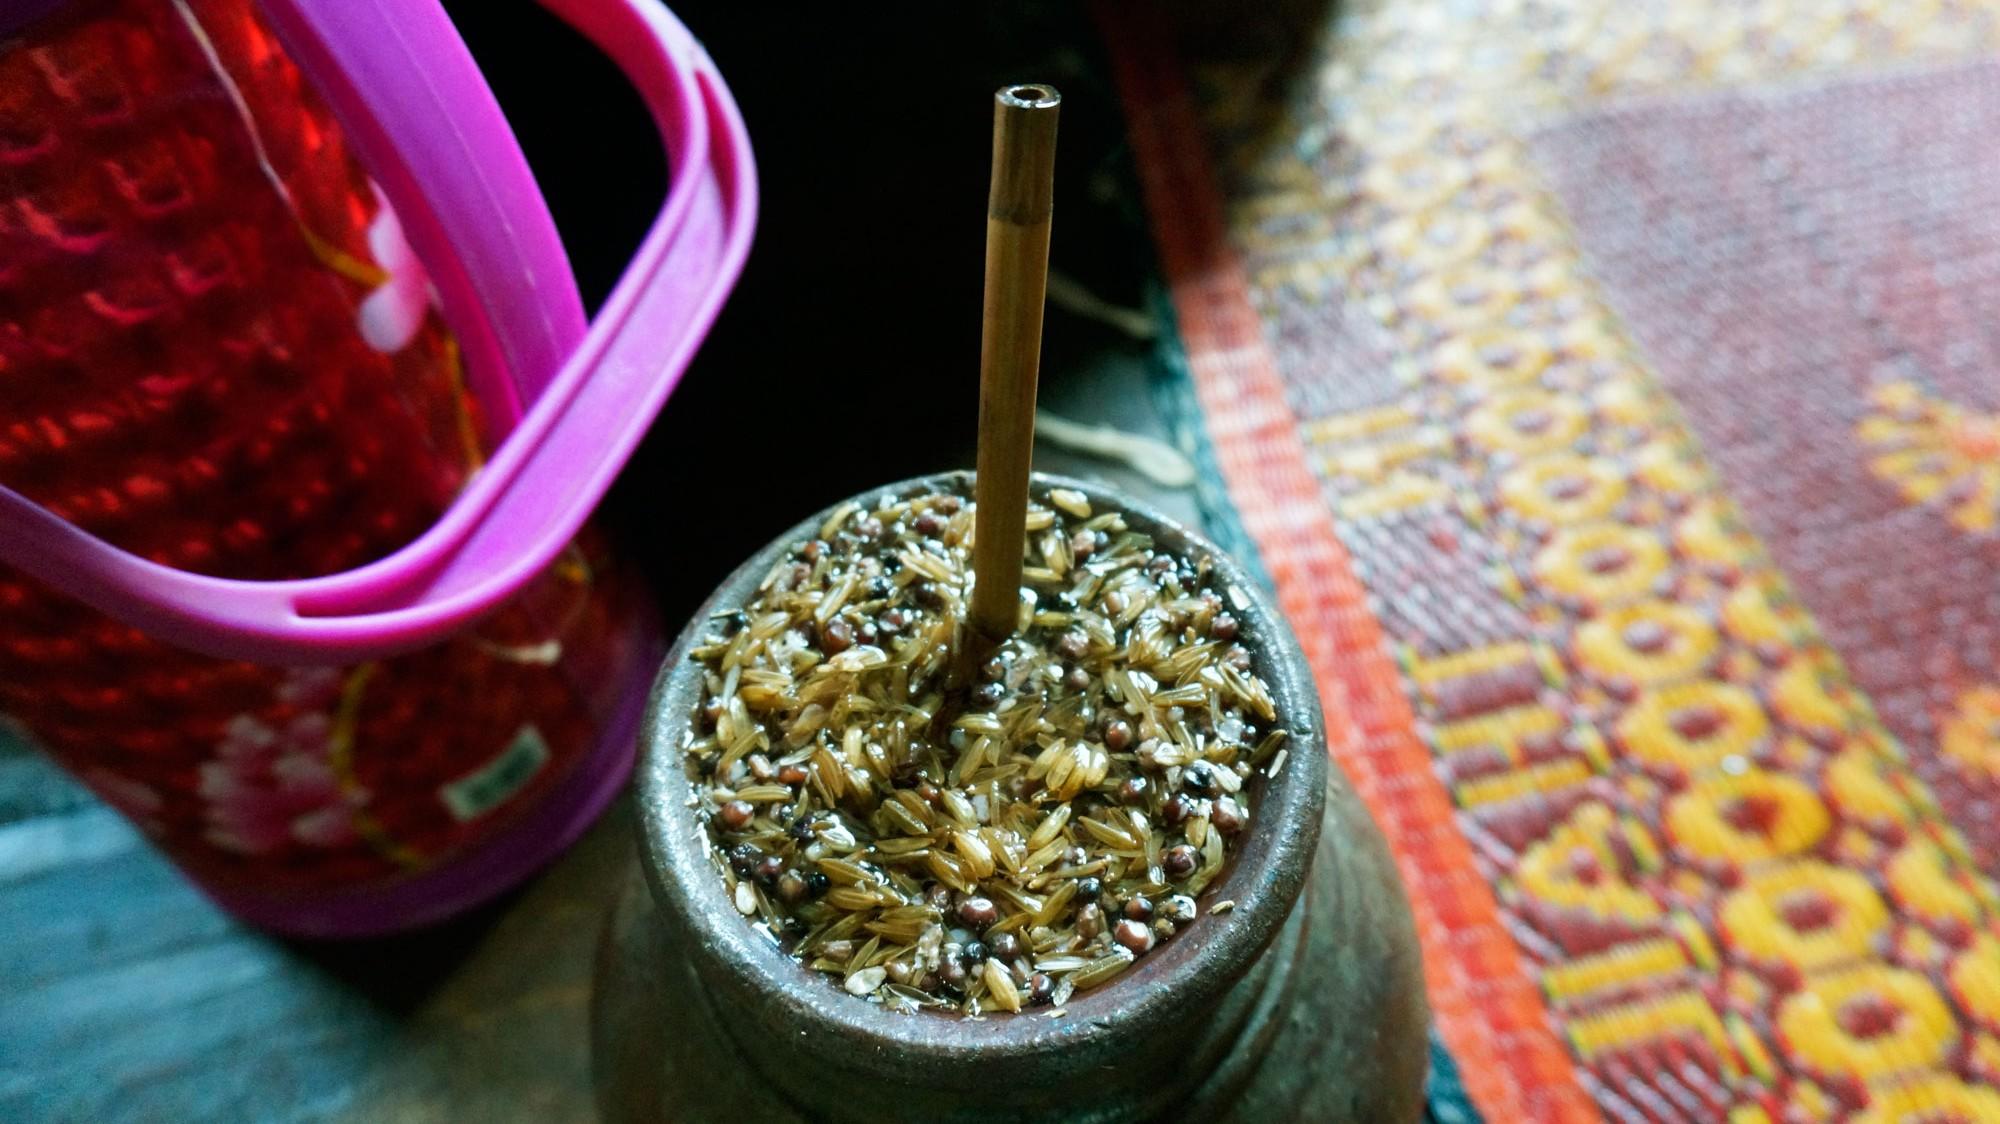 myanmar-opium-farmer